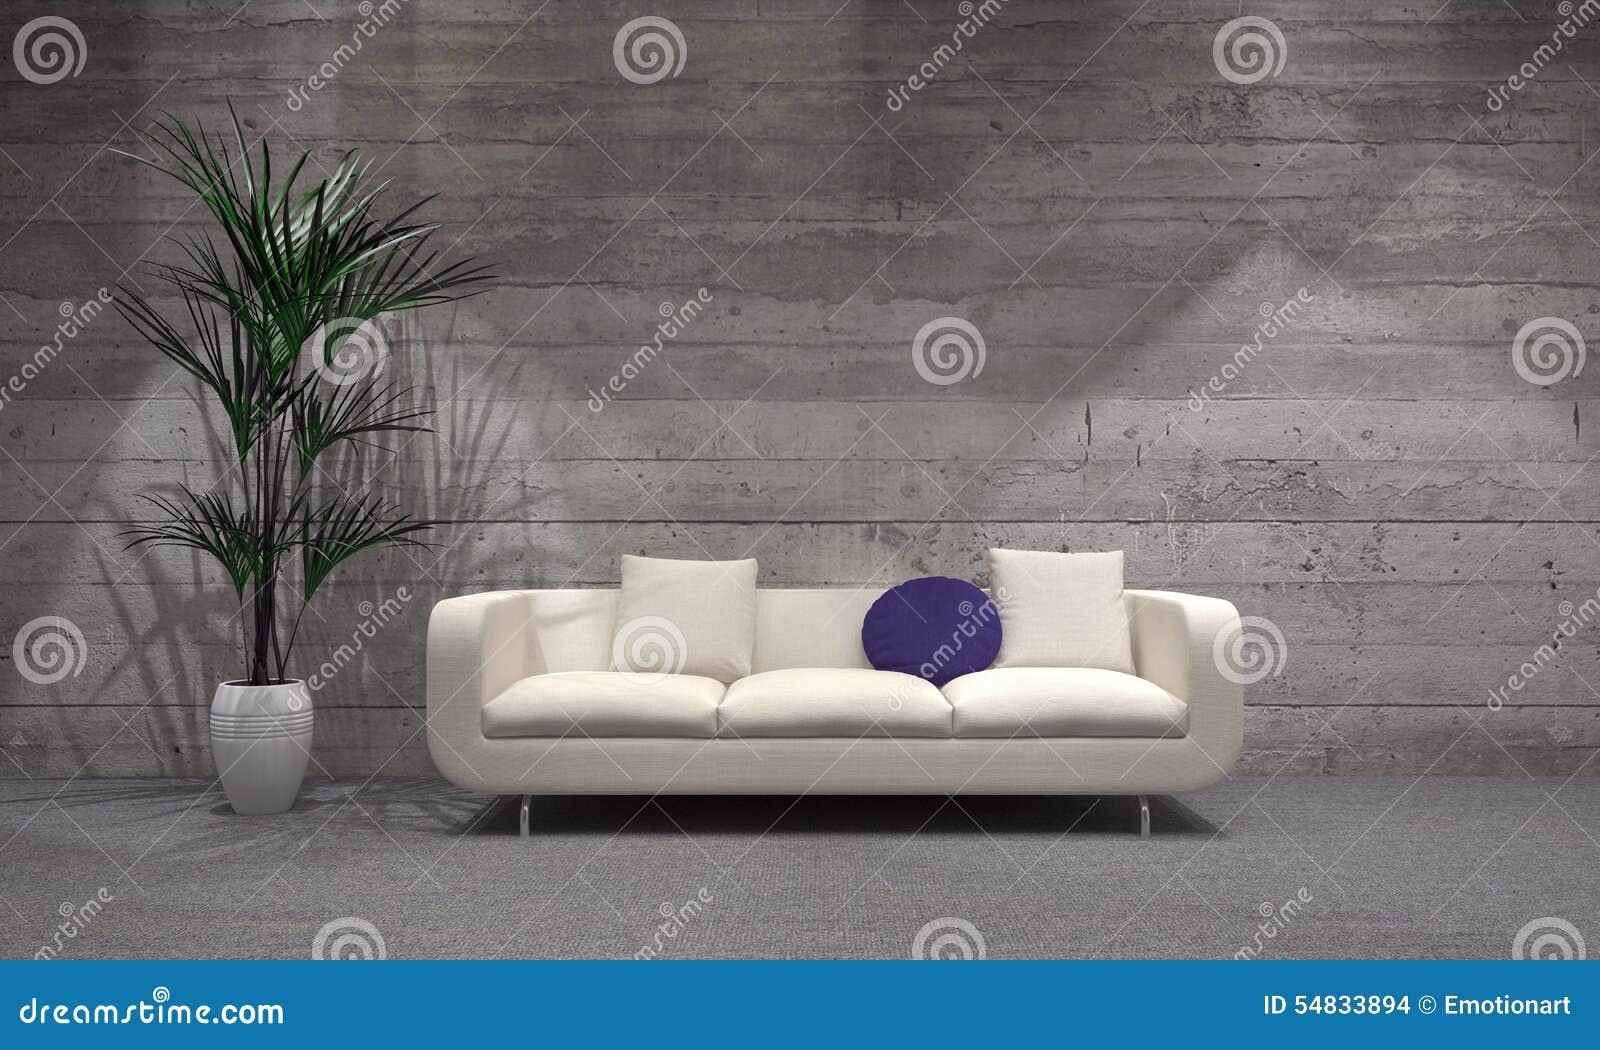 Sofá e planta no vaso na sala de visitas moderna